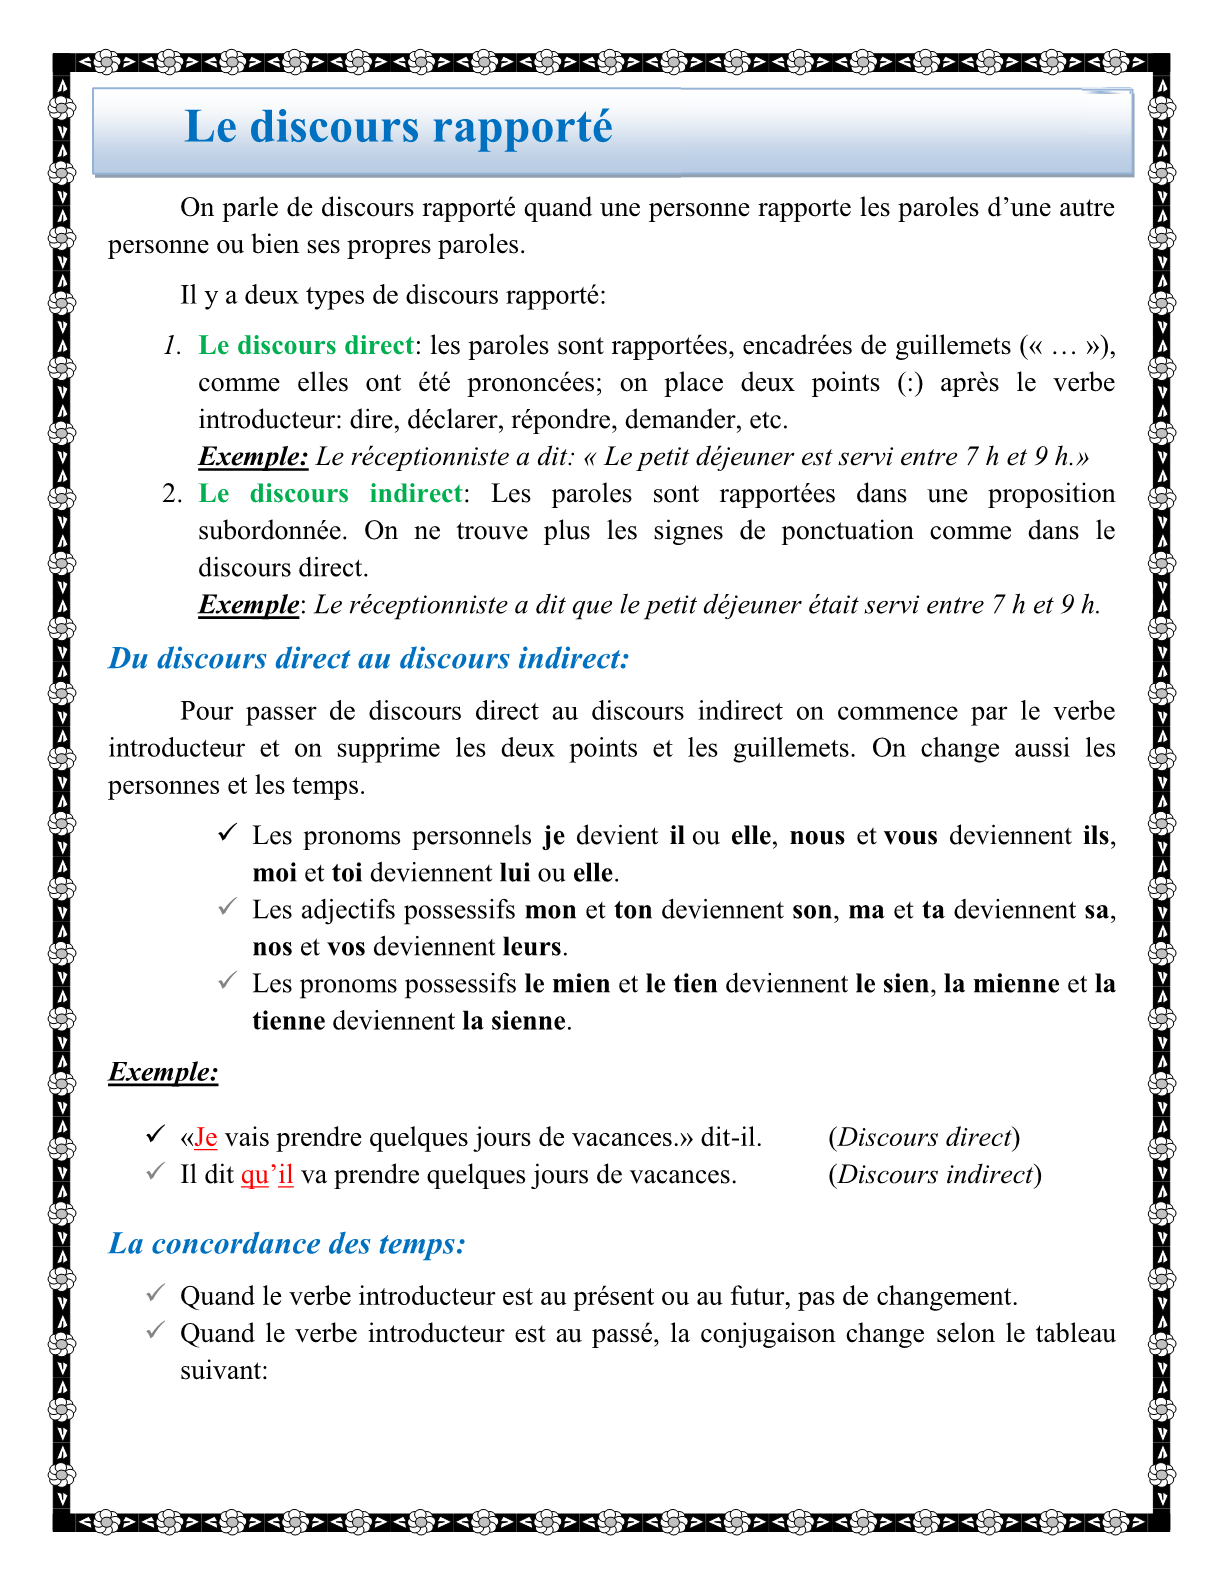 درس Le Discours Rapporté الثانية اعدادي